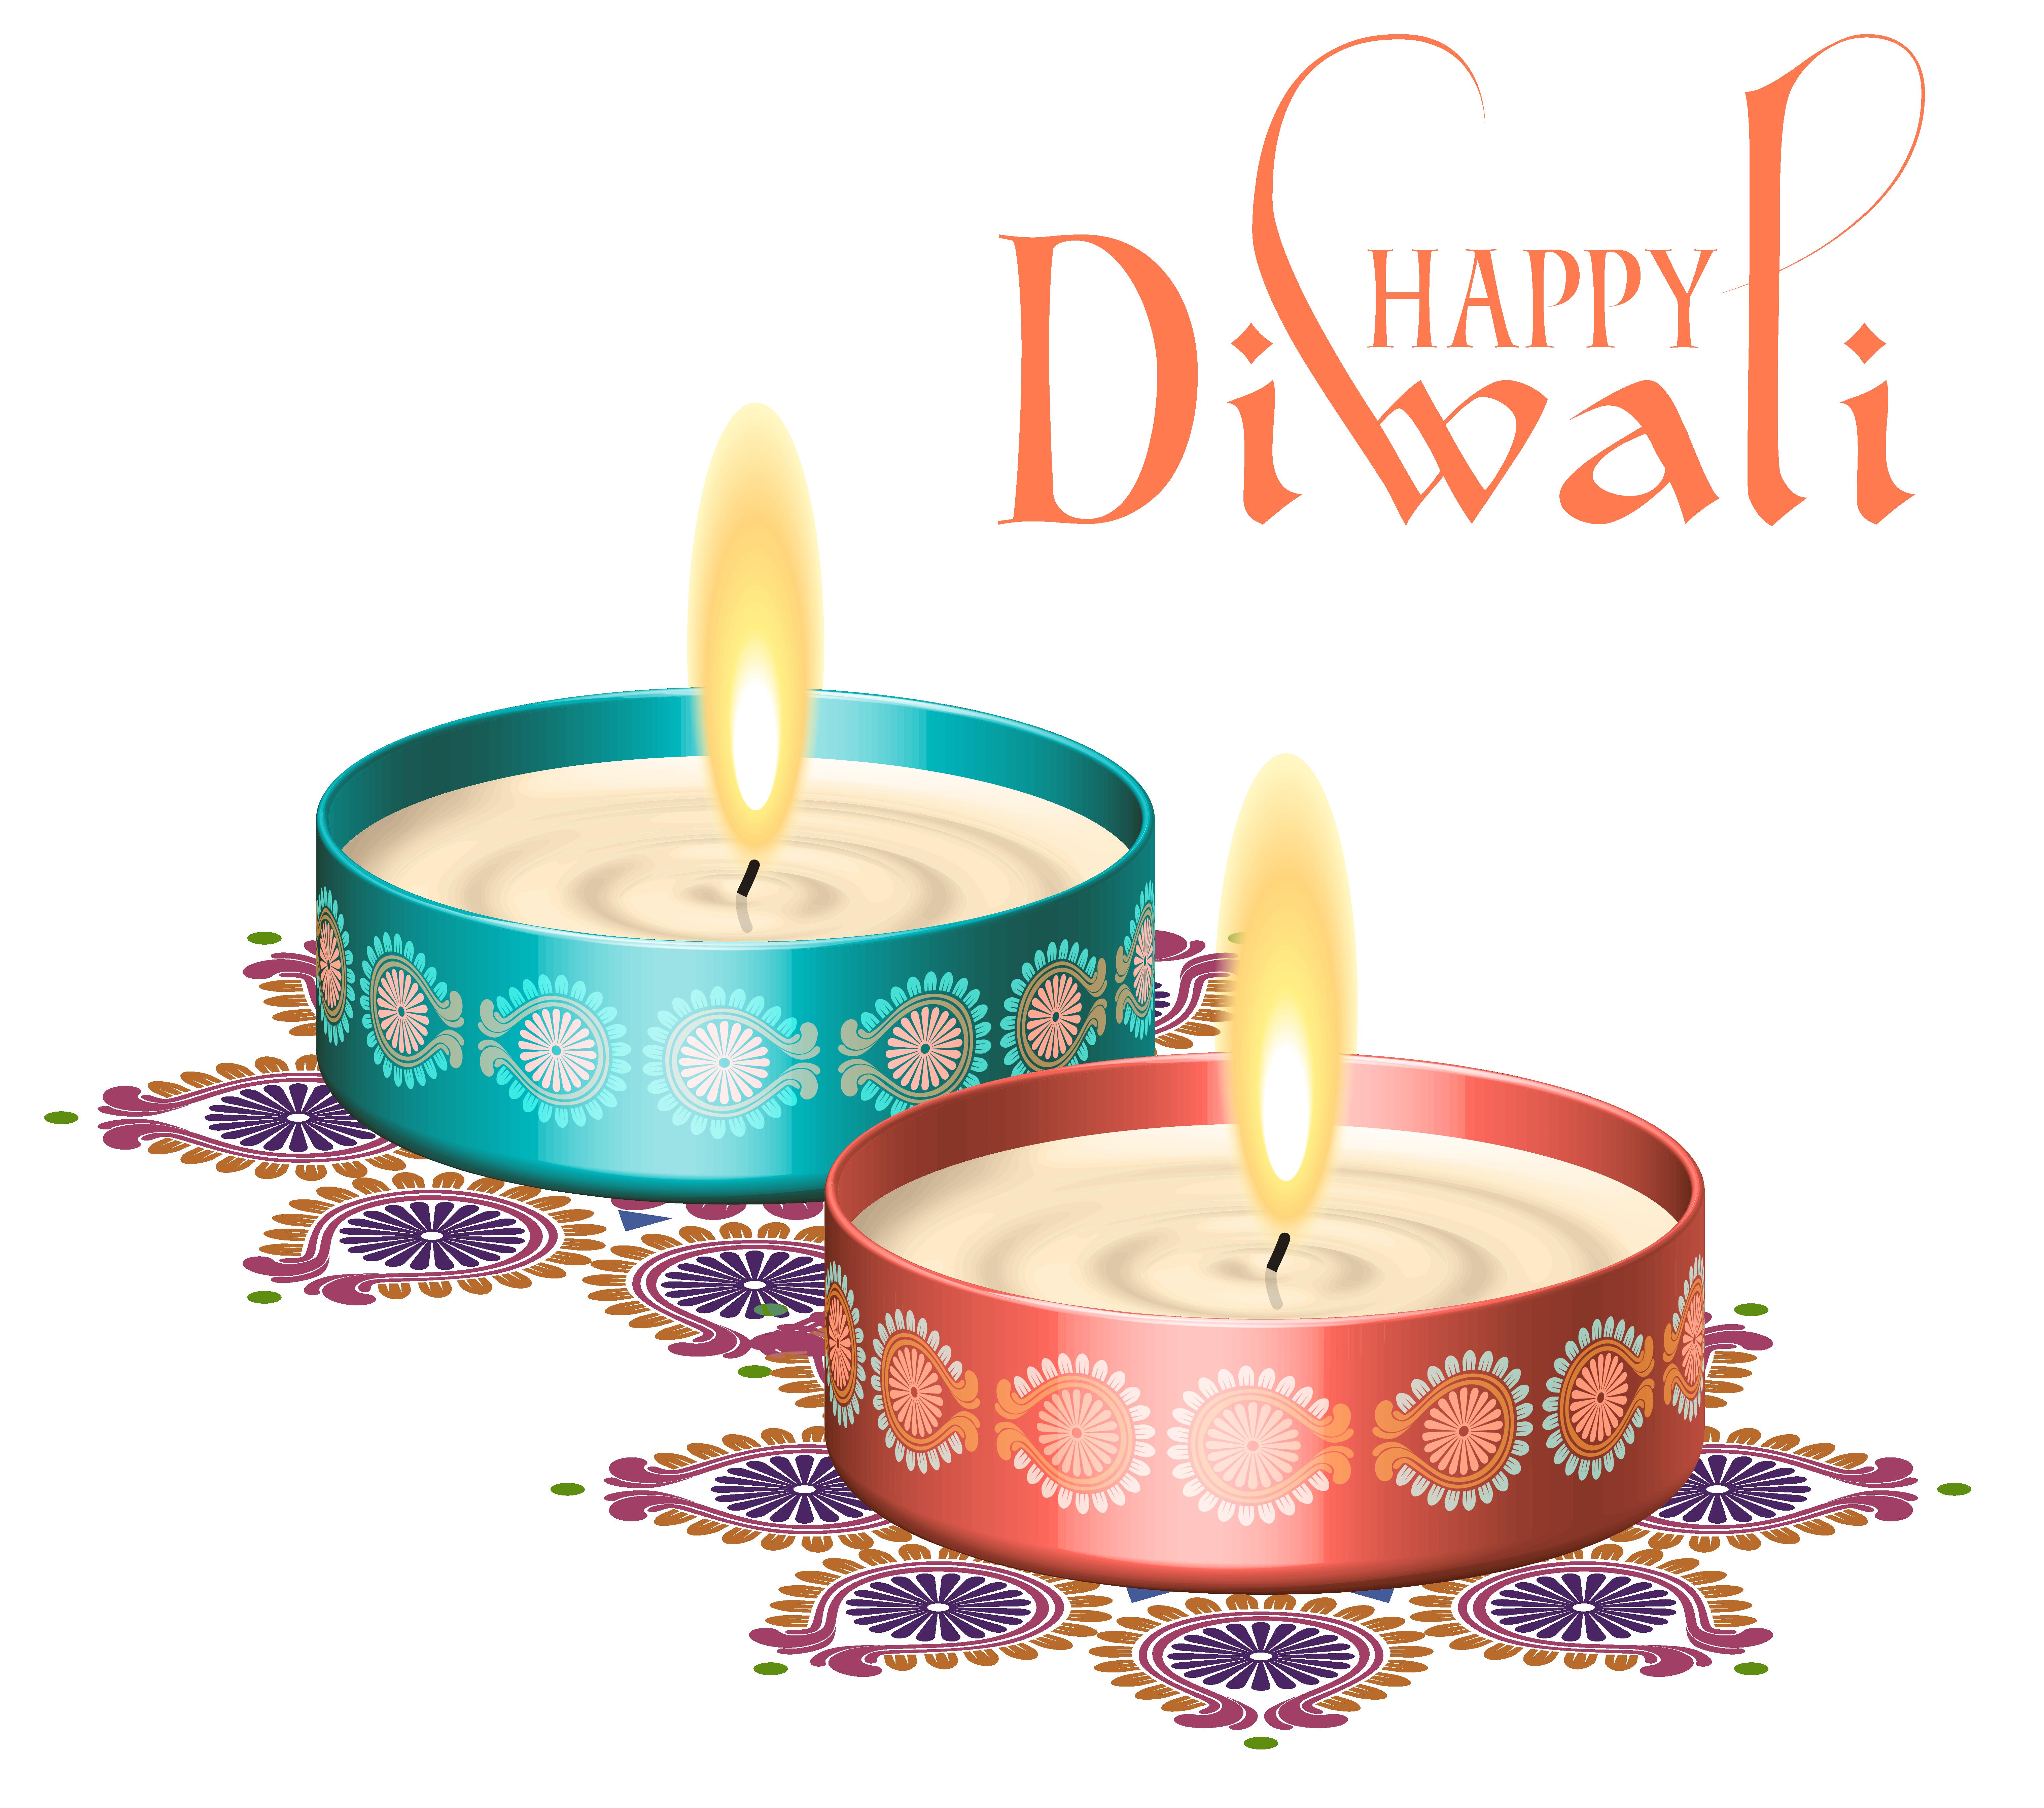 Free Diwali Cliparts, Download Free Clip Art, Free Clip Art.